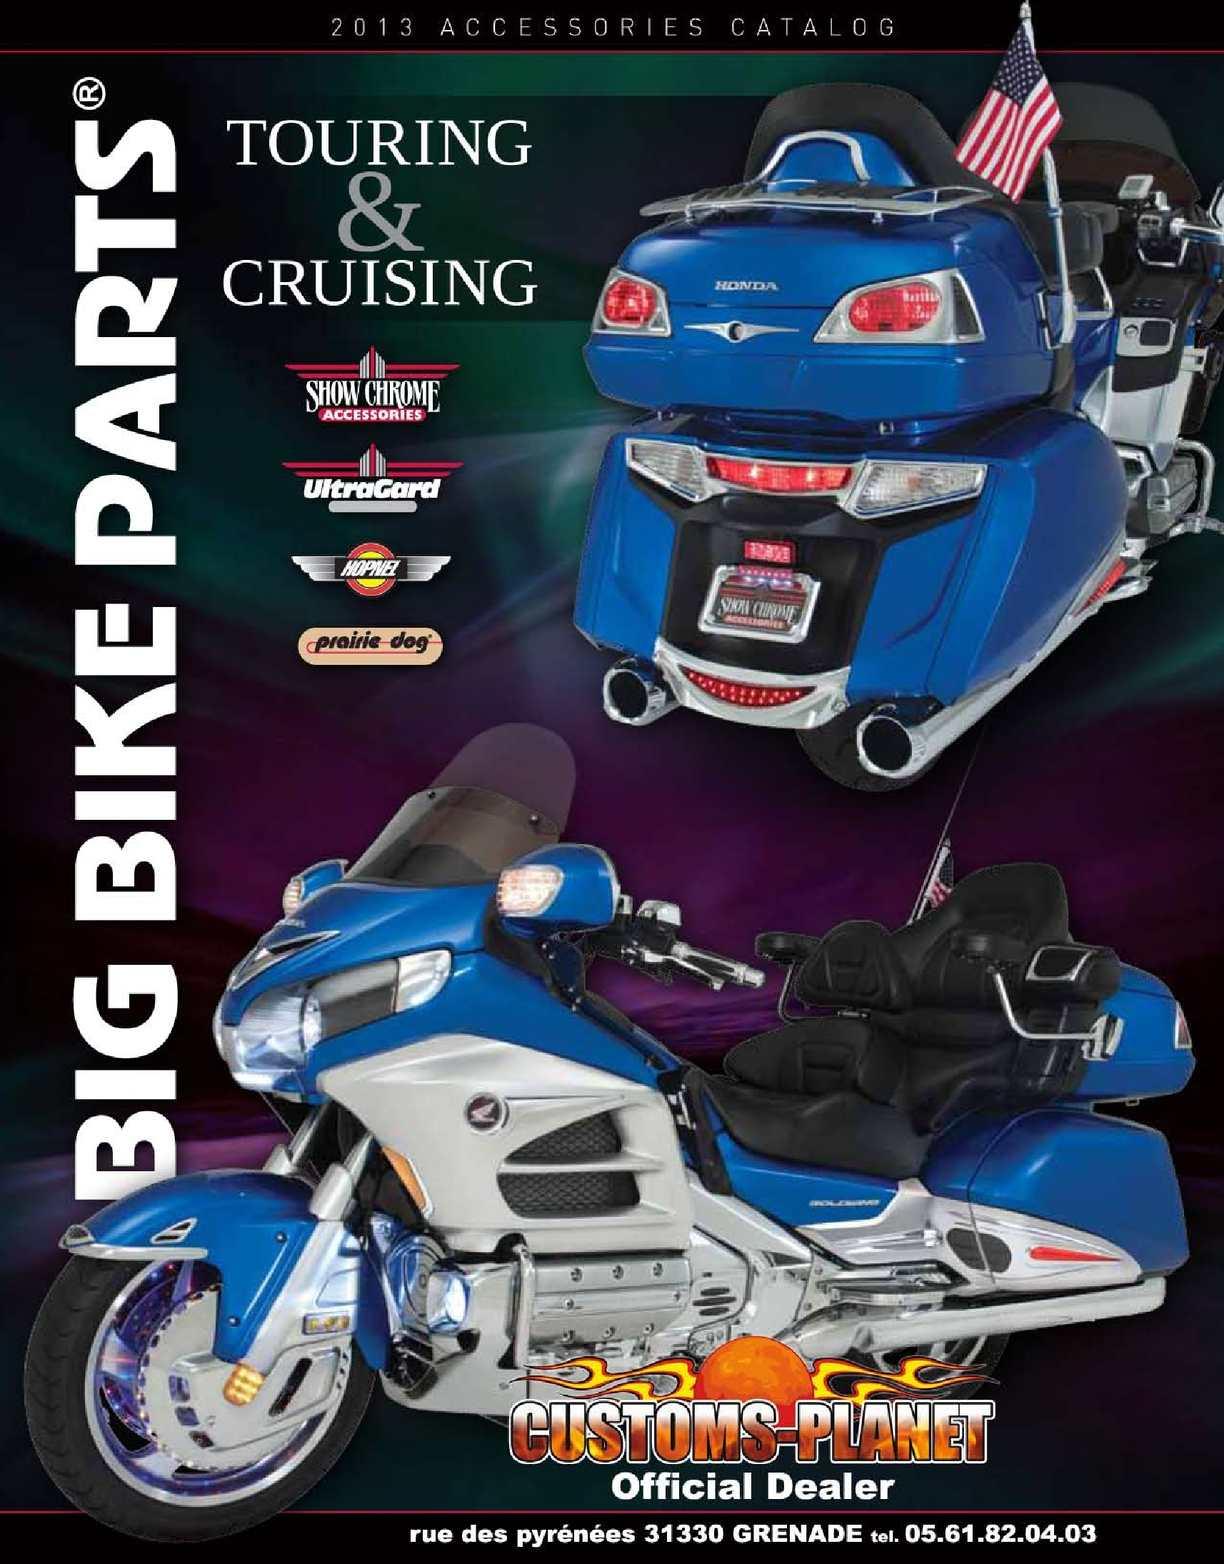 Calamo Catalogue Big Bike Parts Par Customs Planet R1200c Fuse Box